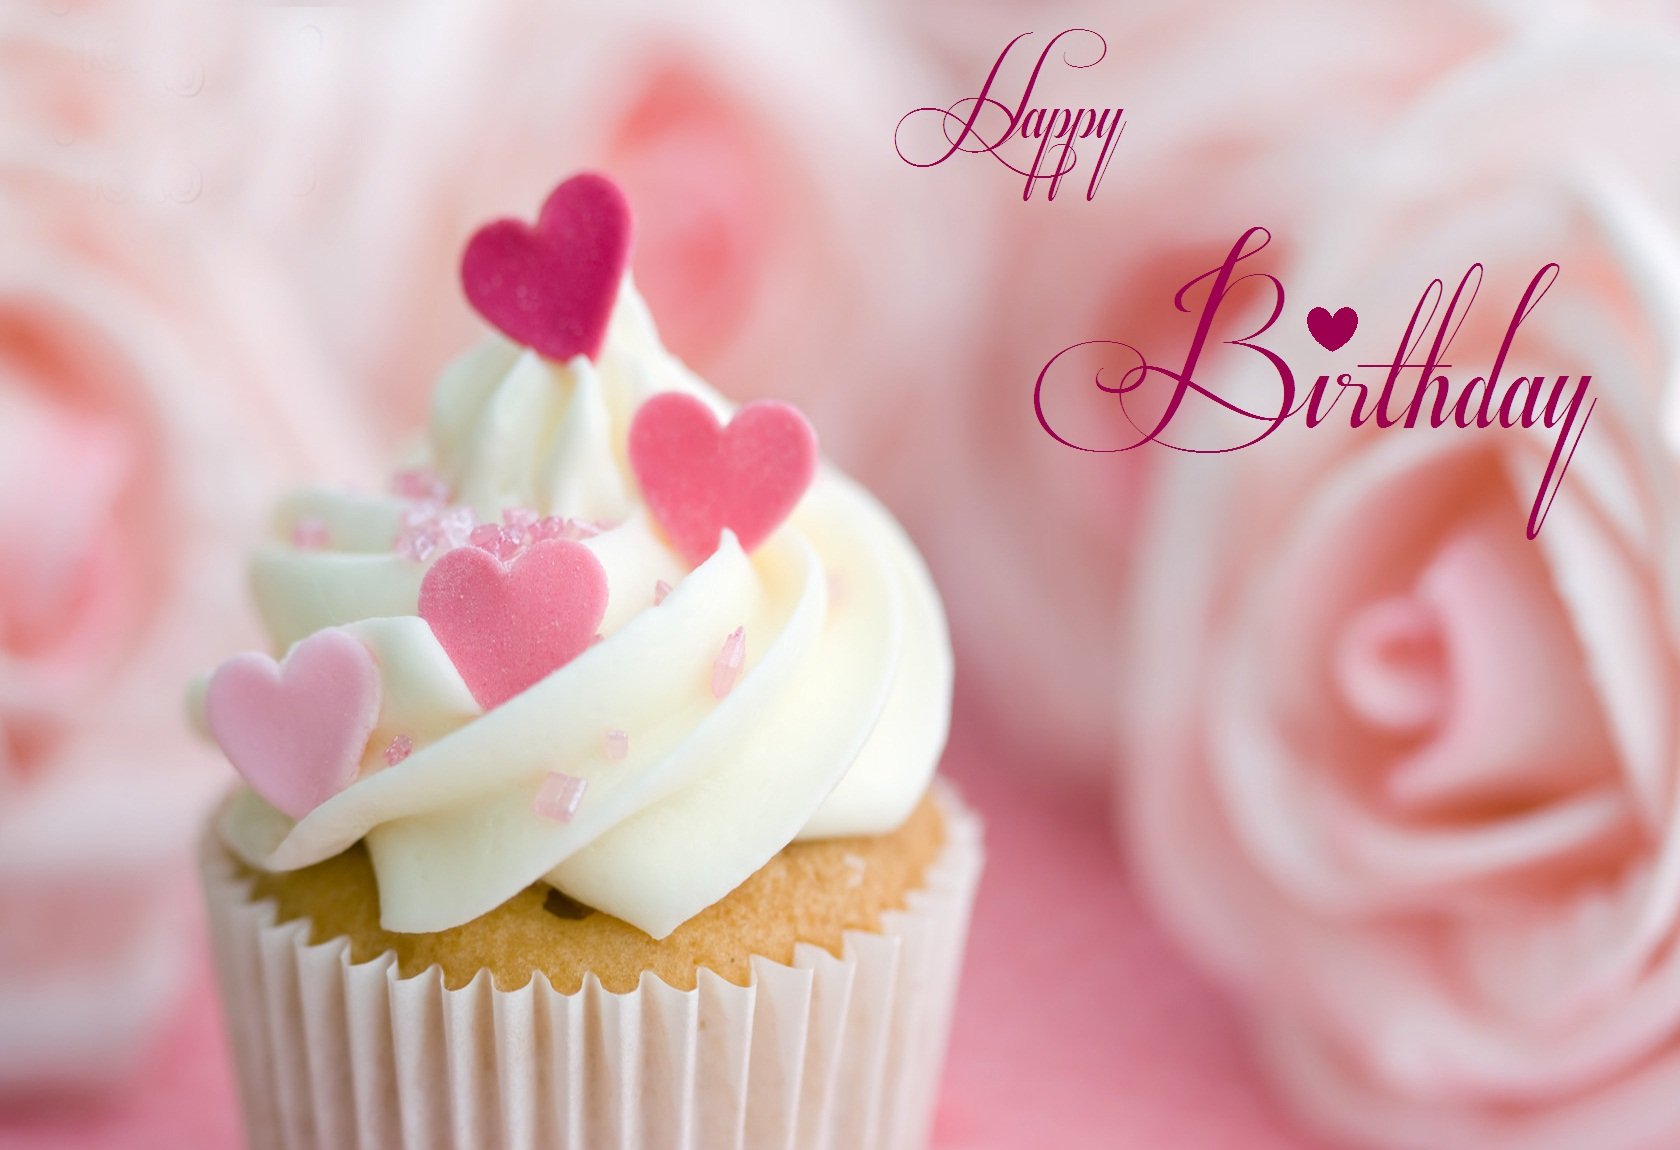 Romantic Cake Happy Birthday Wallpaper HD Wallpaper with 1680x1150 1680x1150